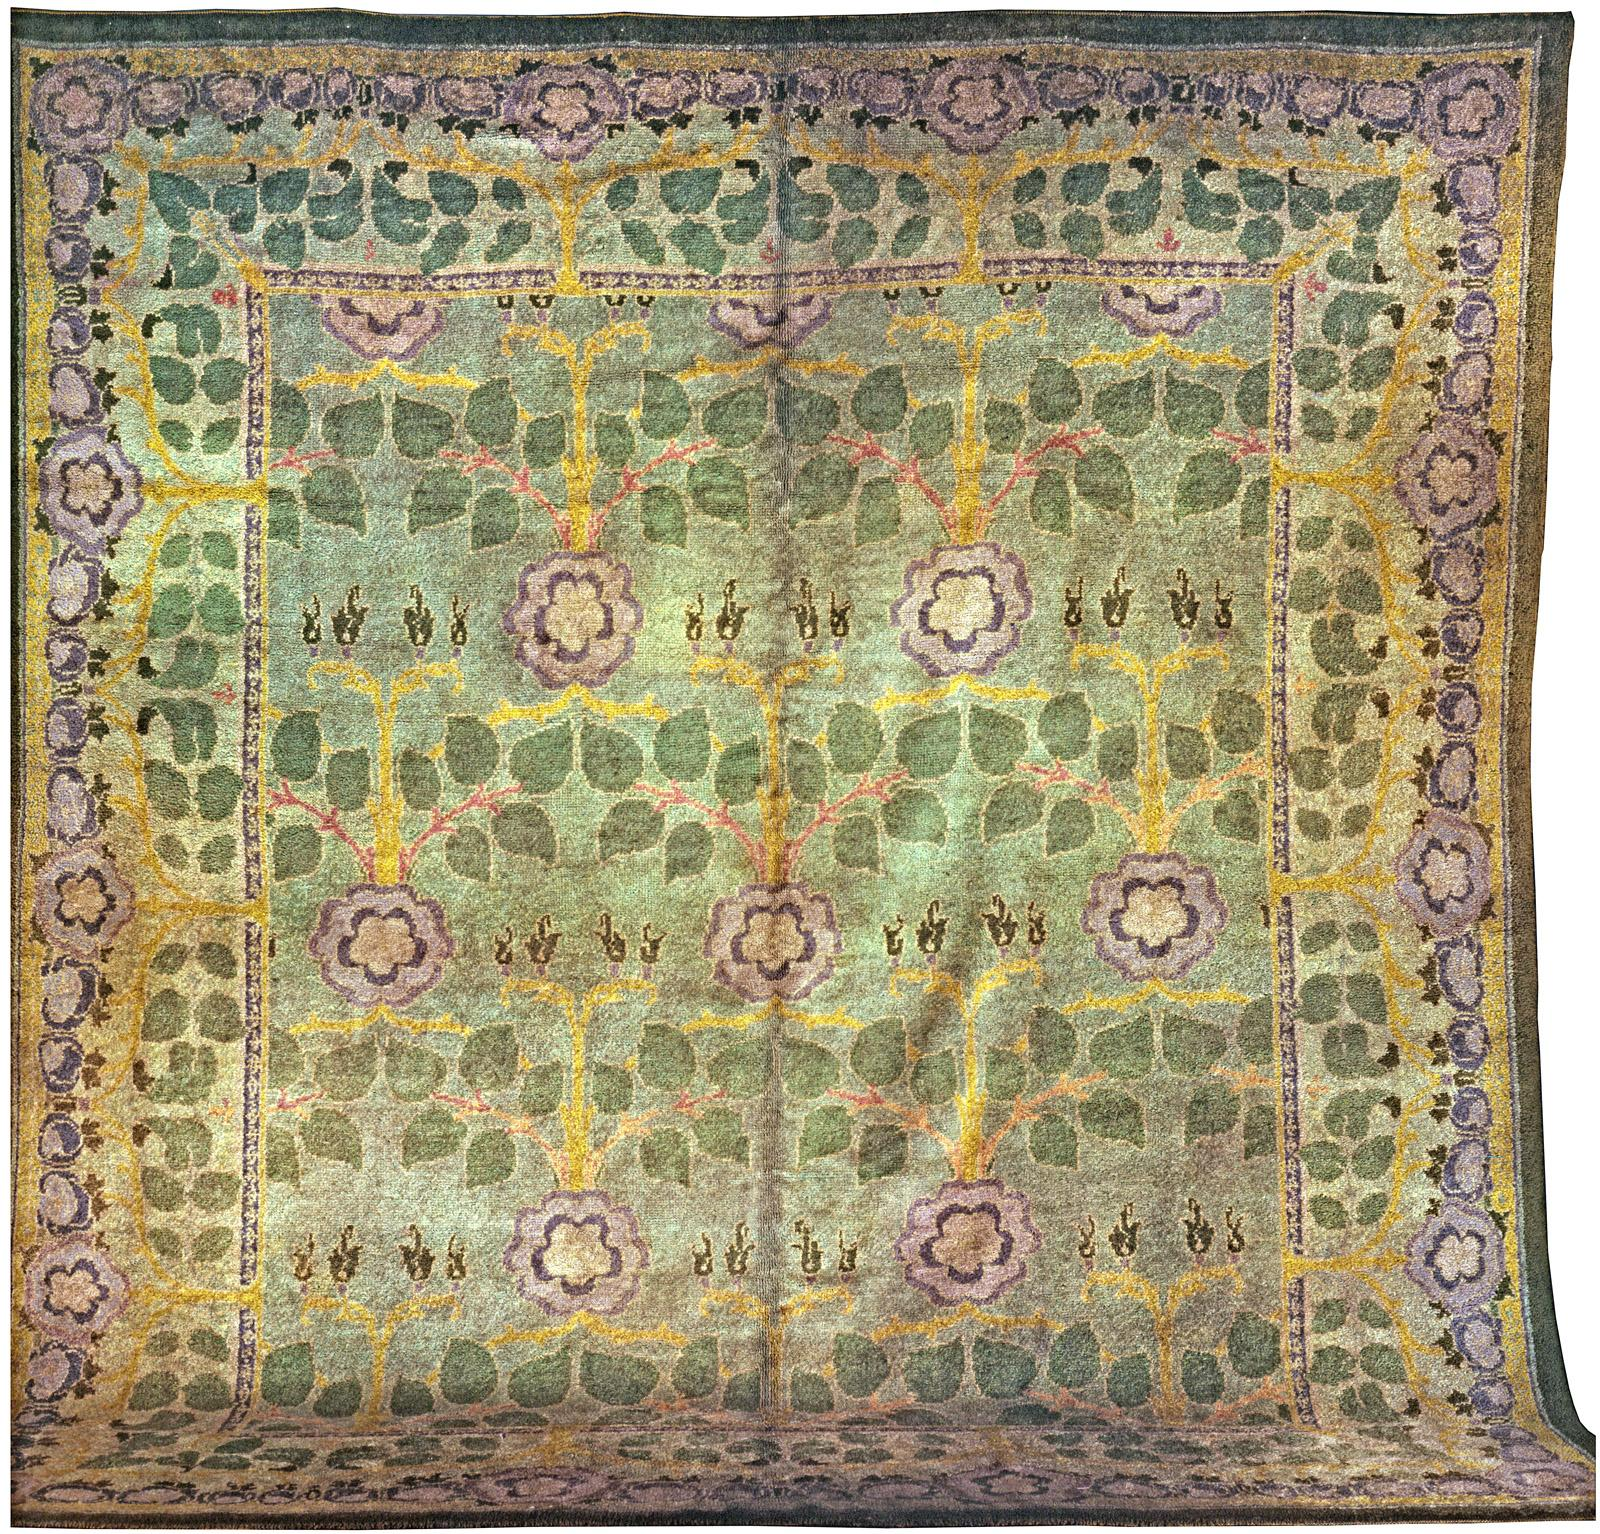 Donegal Carpet